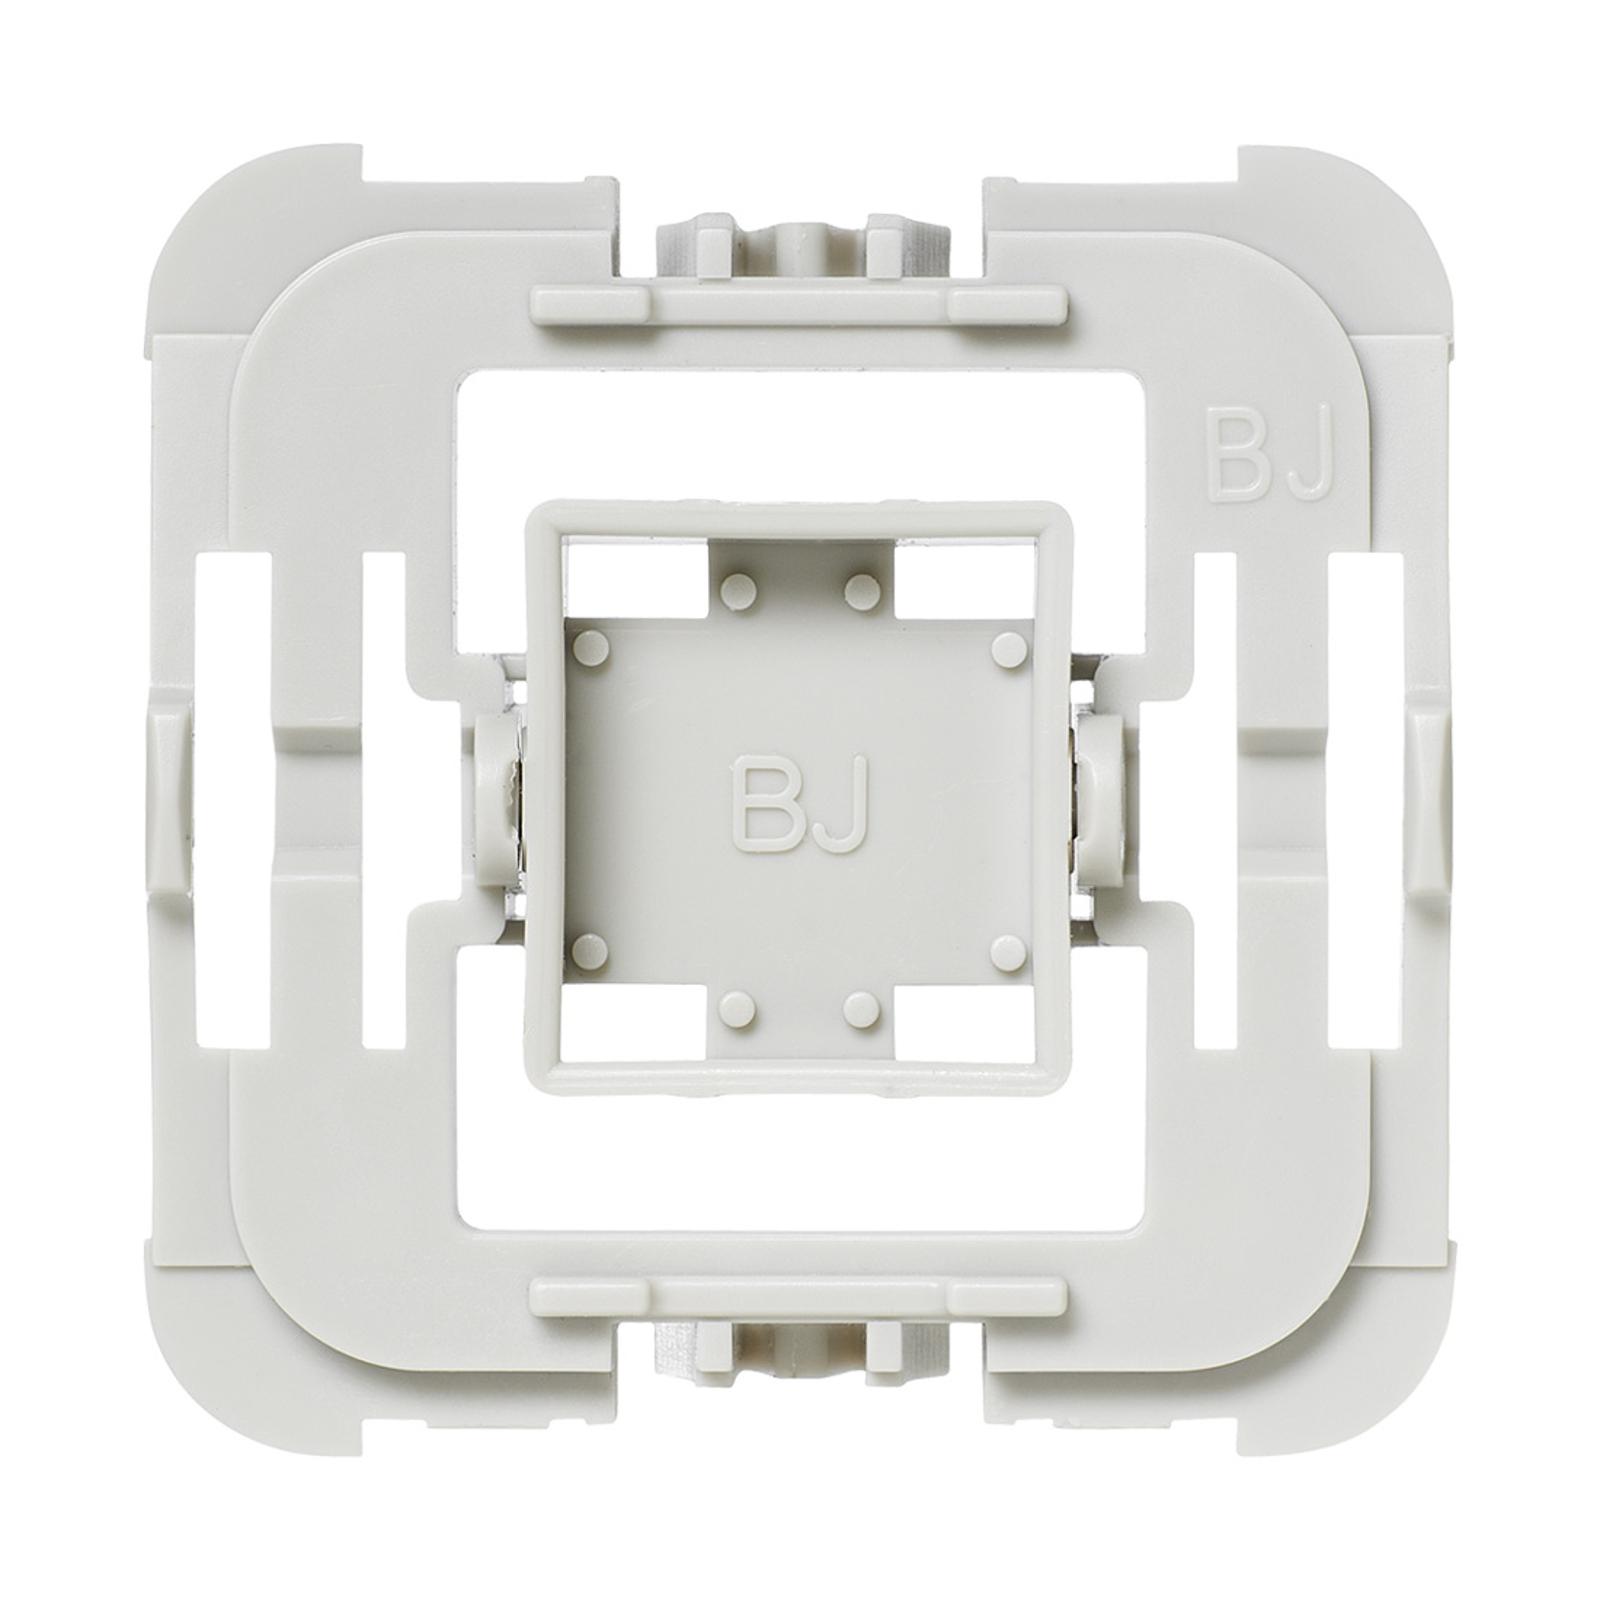 Homematic IP adaptador interruptor Busch-Jaeger 1x